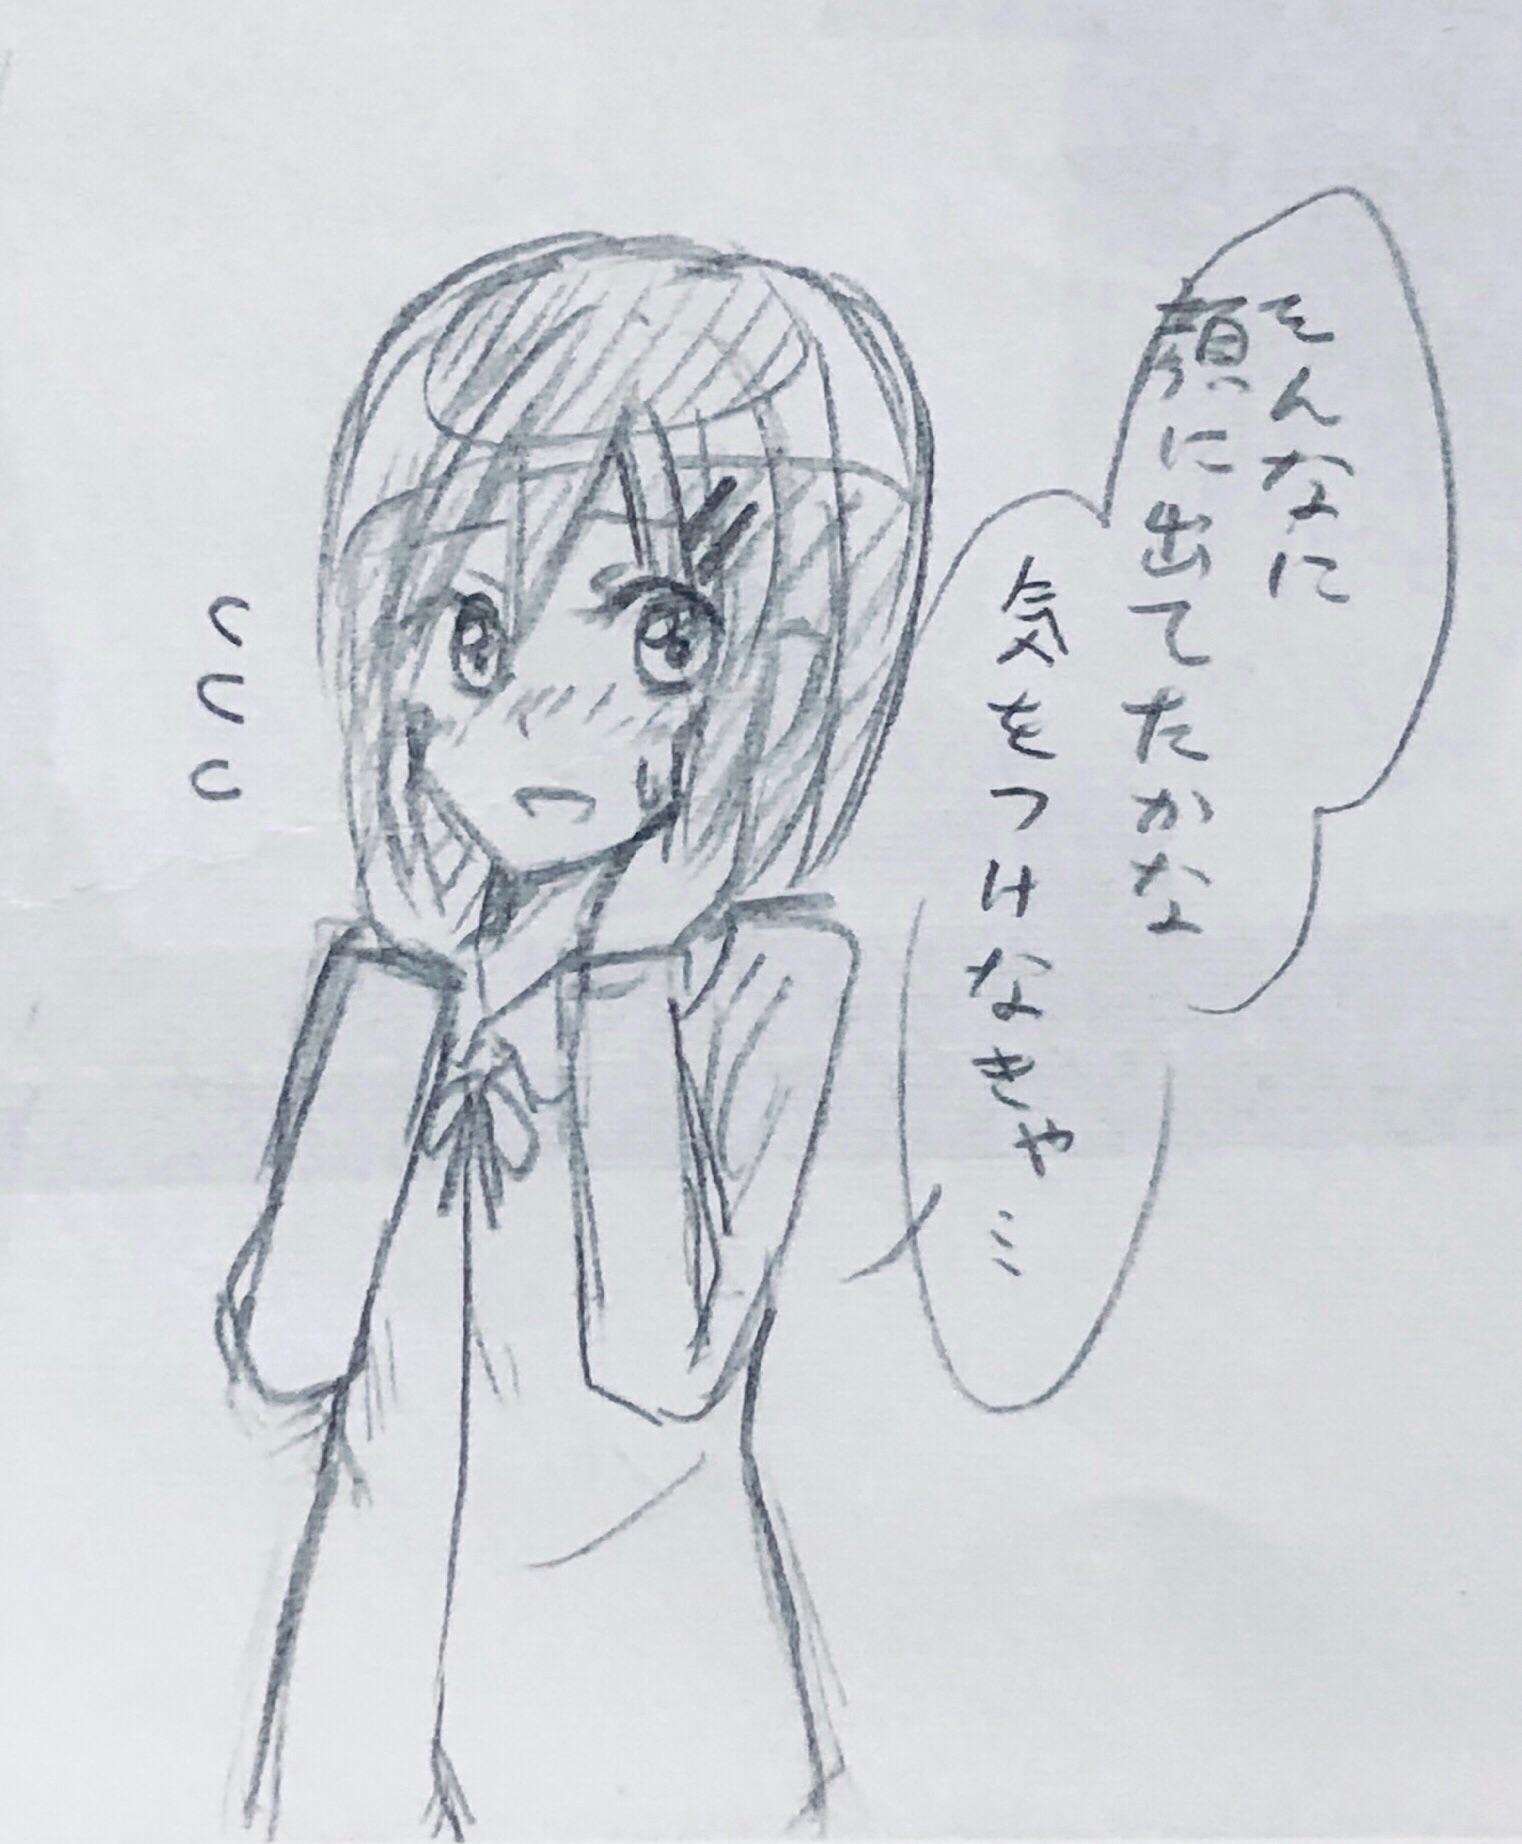 f:id:Yuki-19:20201009115627j:image